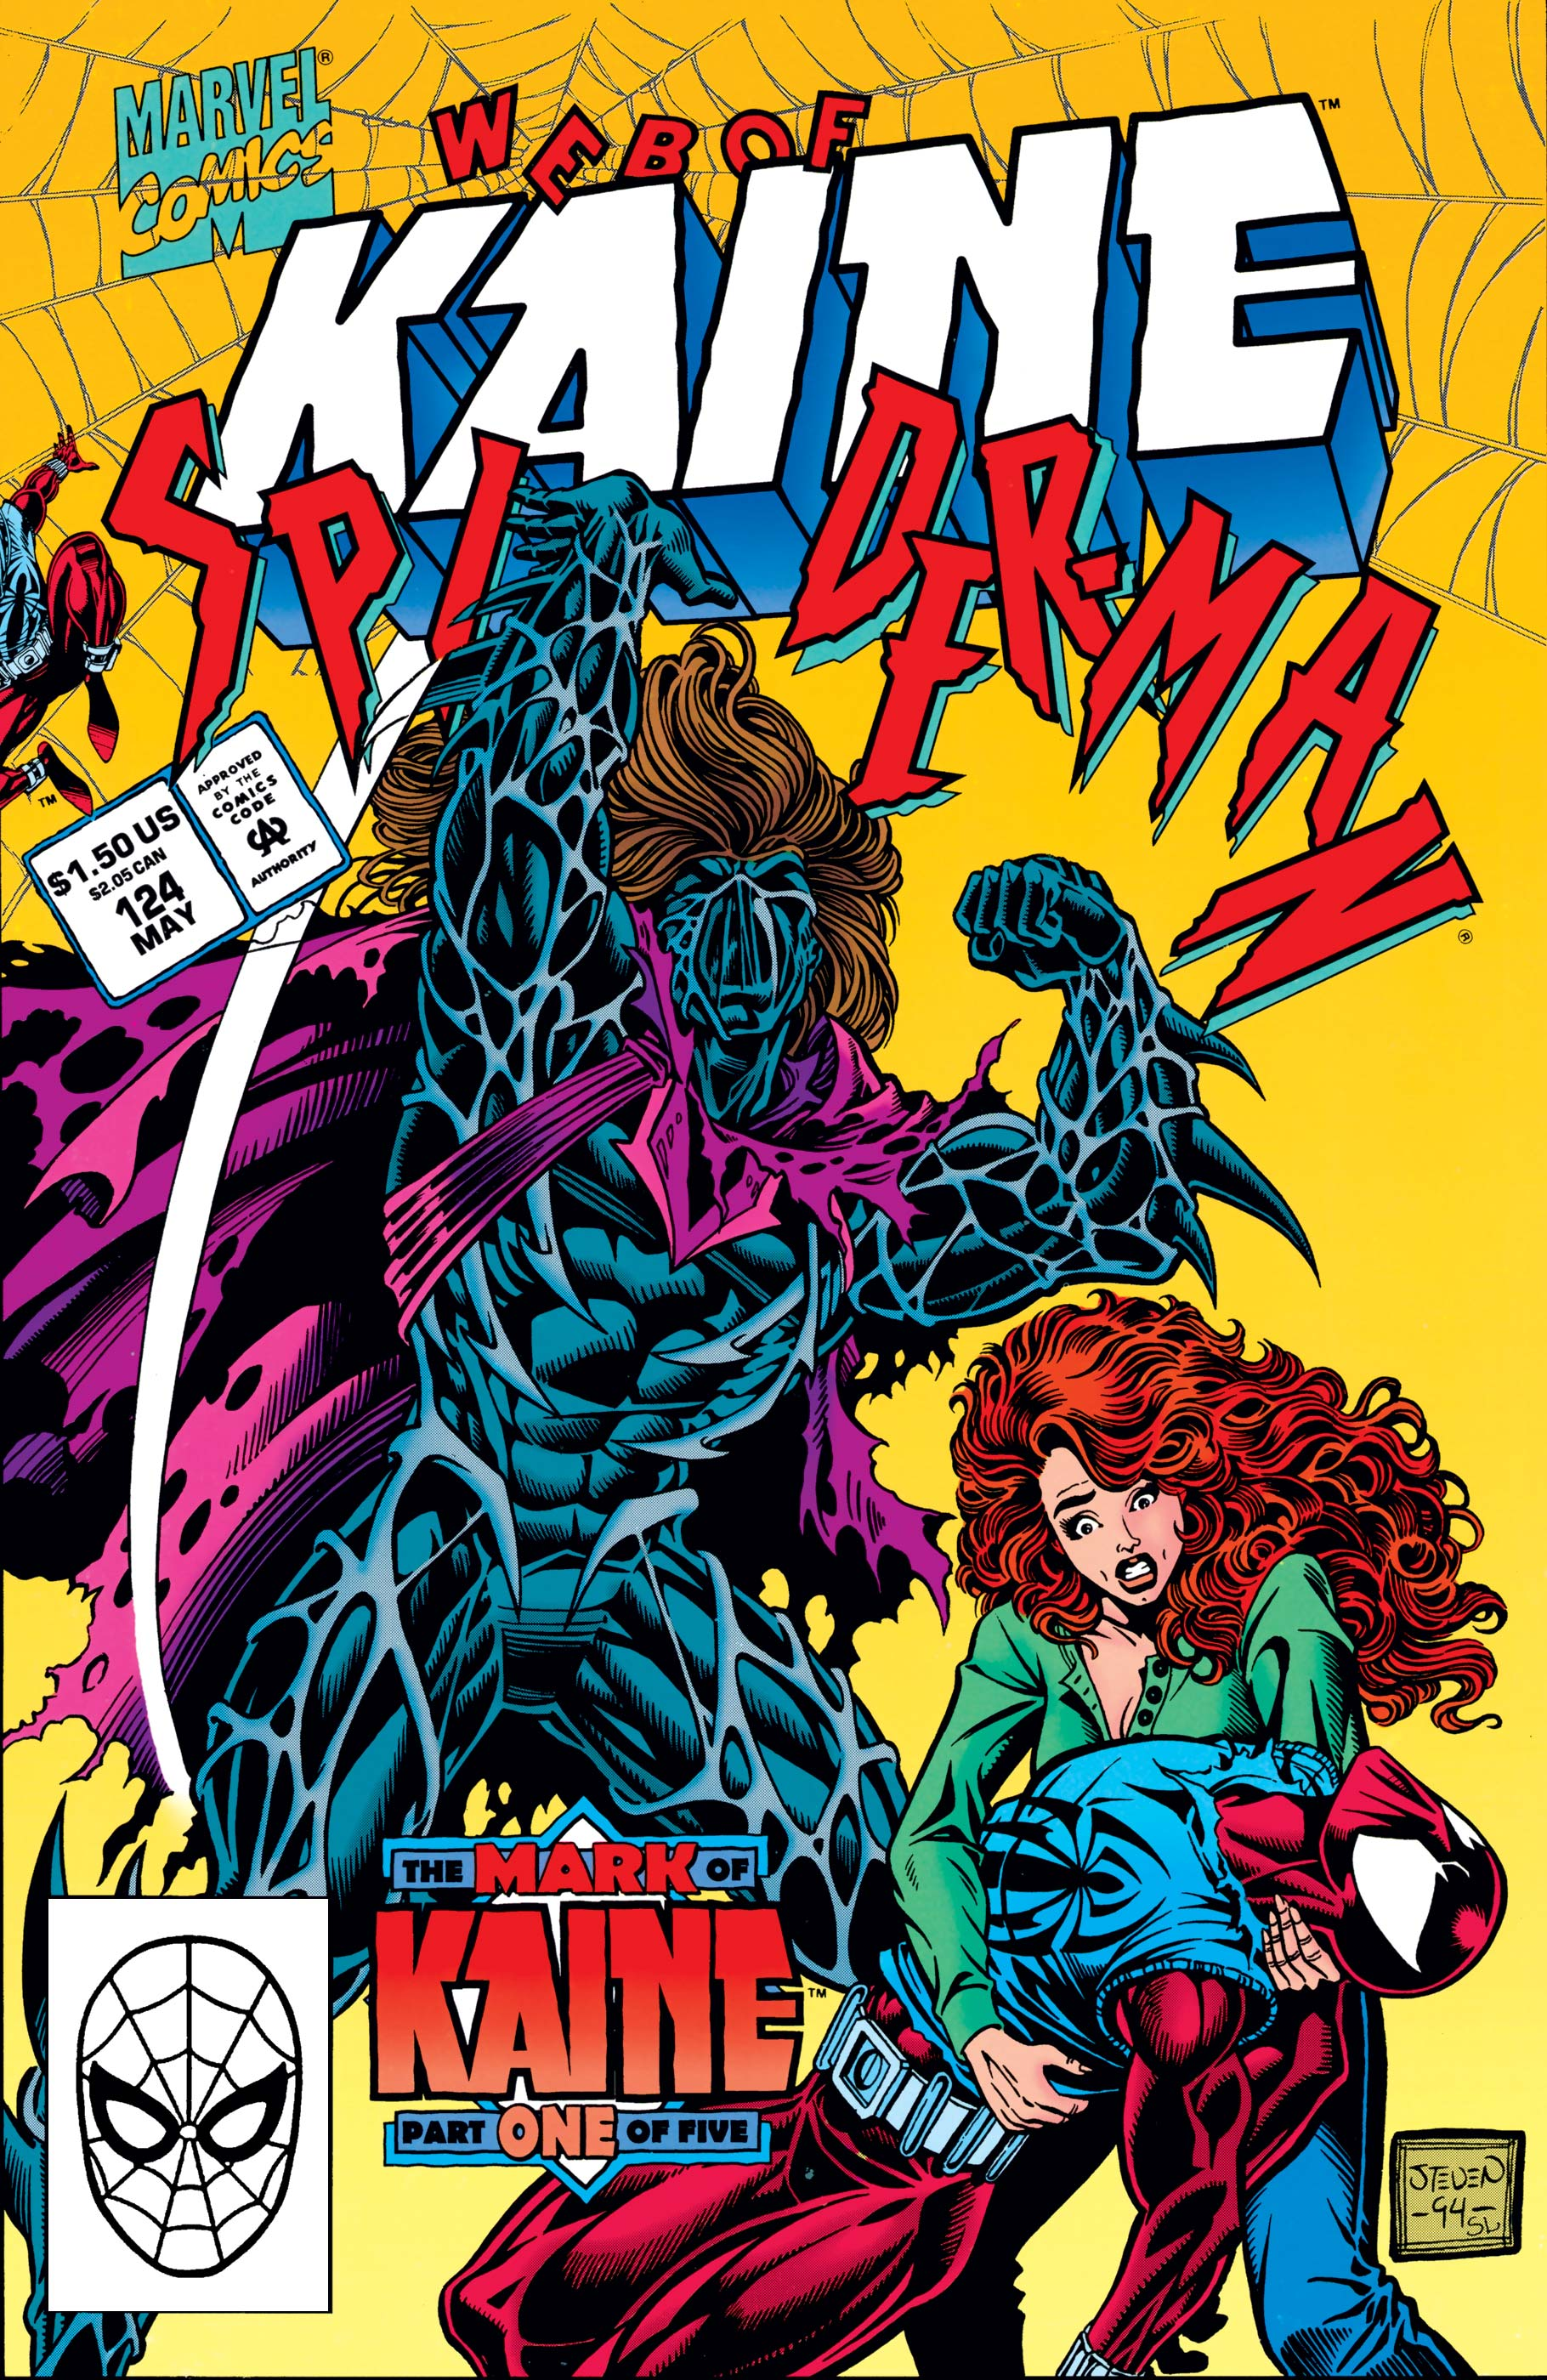 Web of Spider-Man (1985) #124